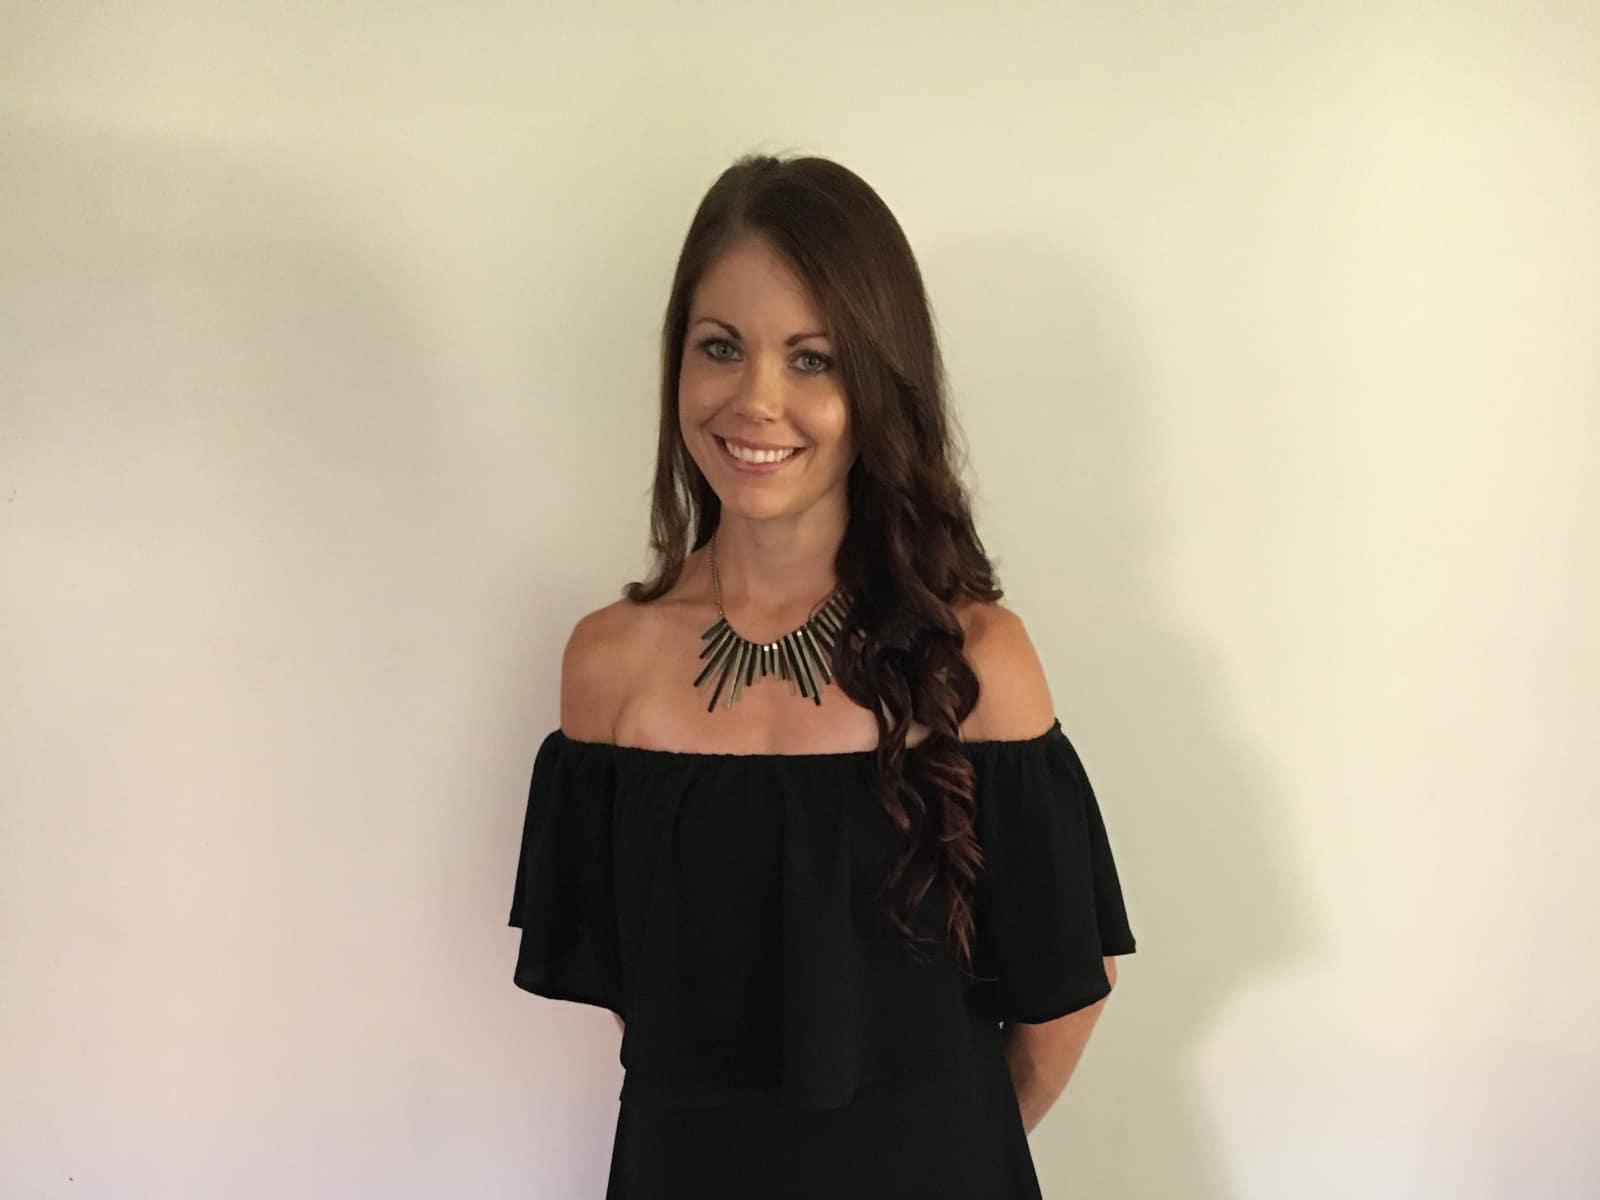 Amy from Baldivis, Western Australia, Australia